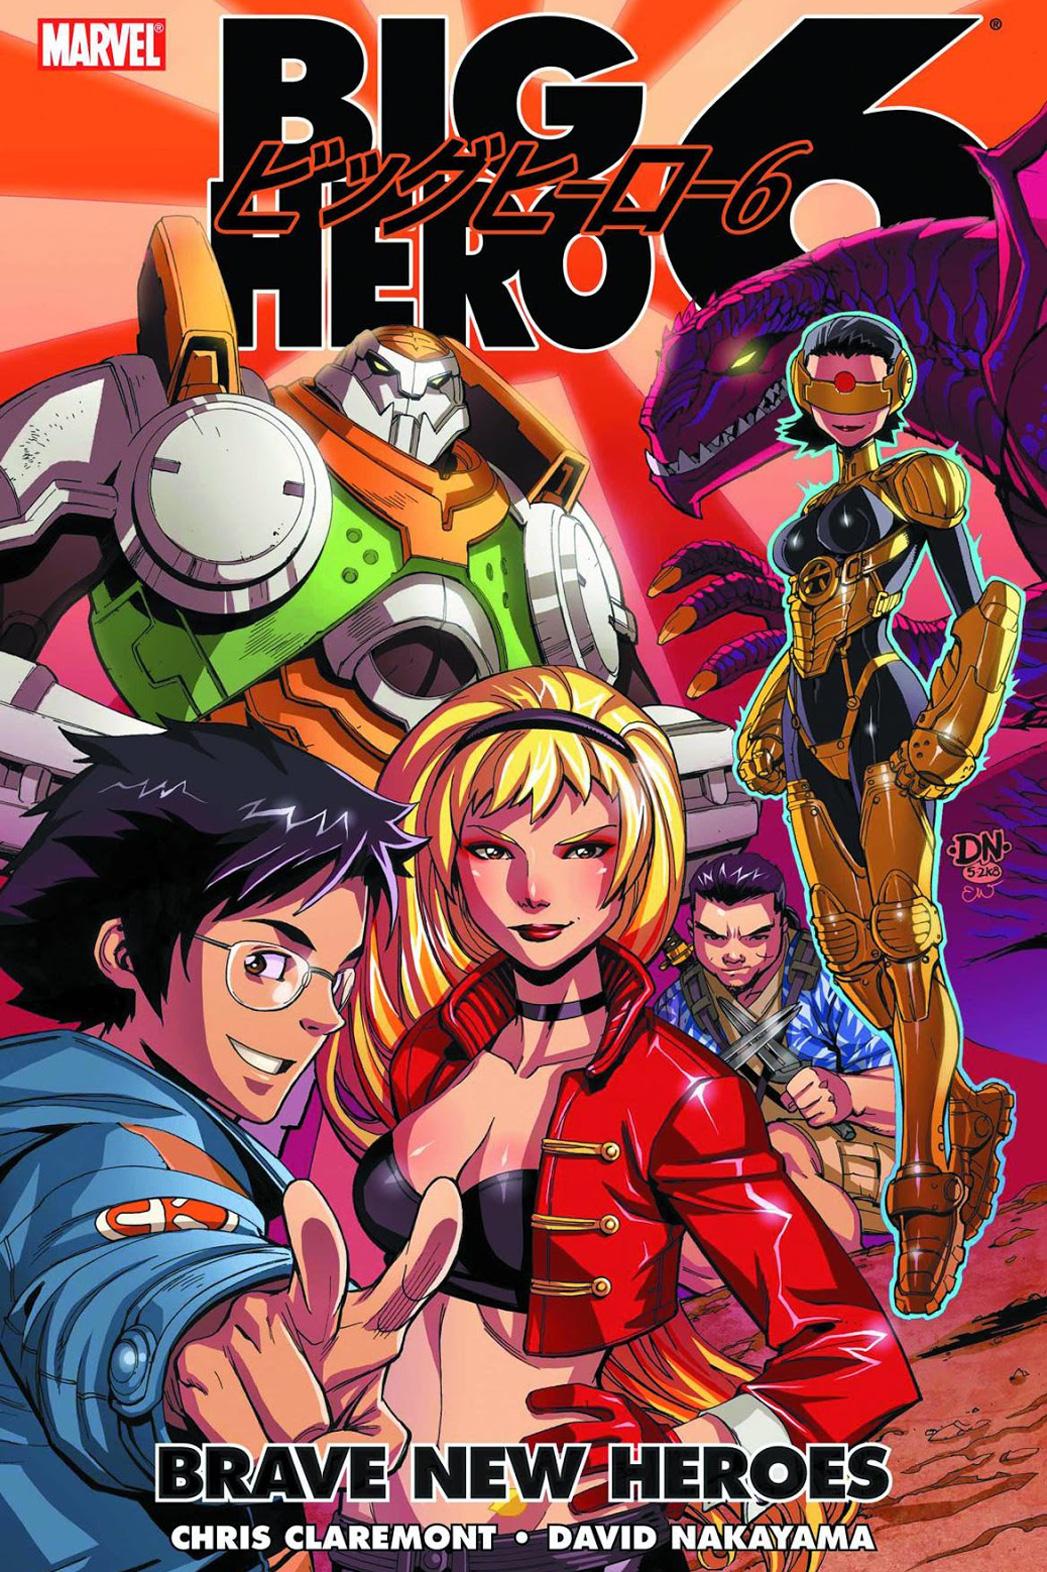 Big Hero 6 Cover - P 2014